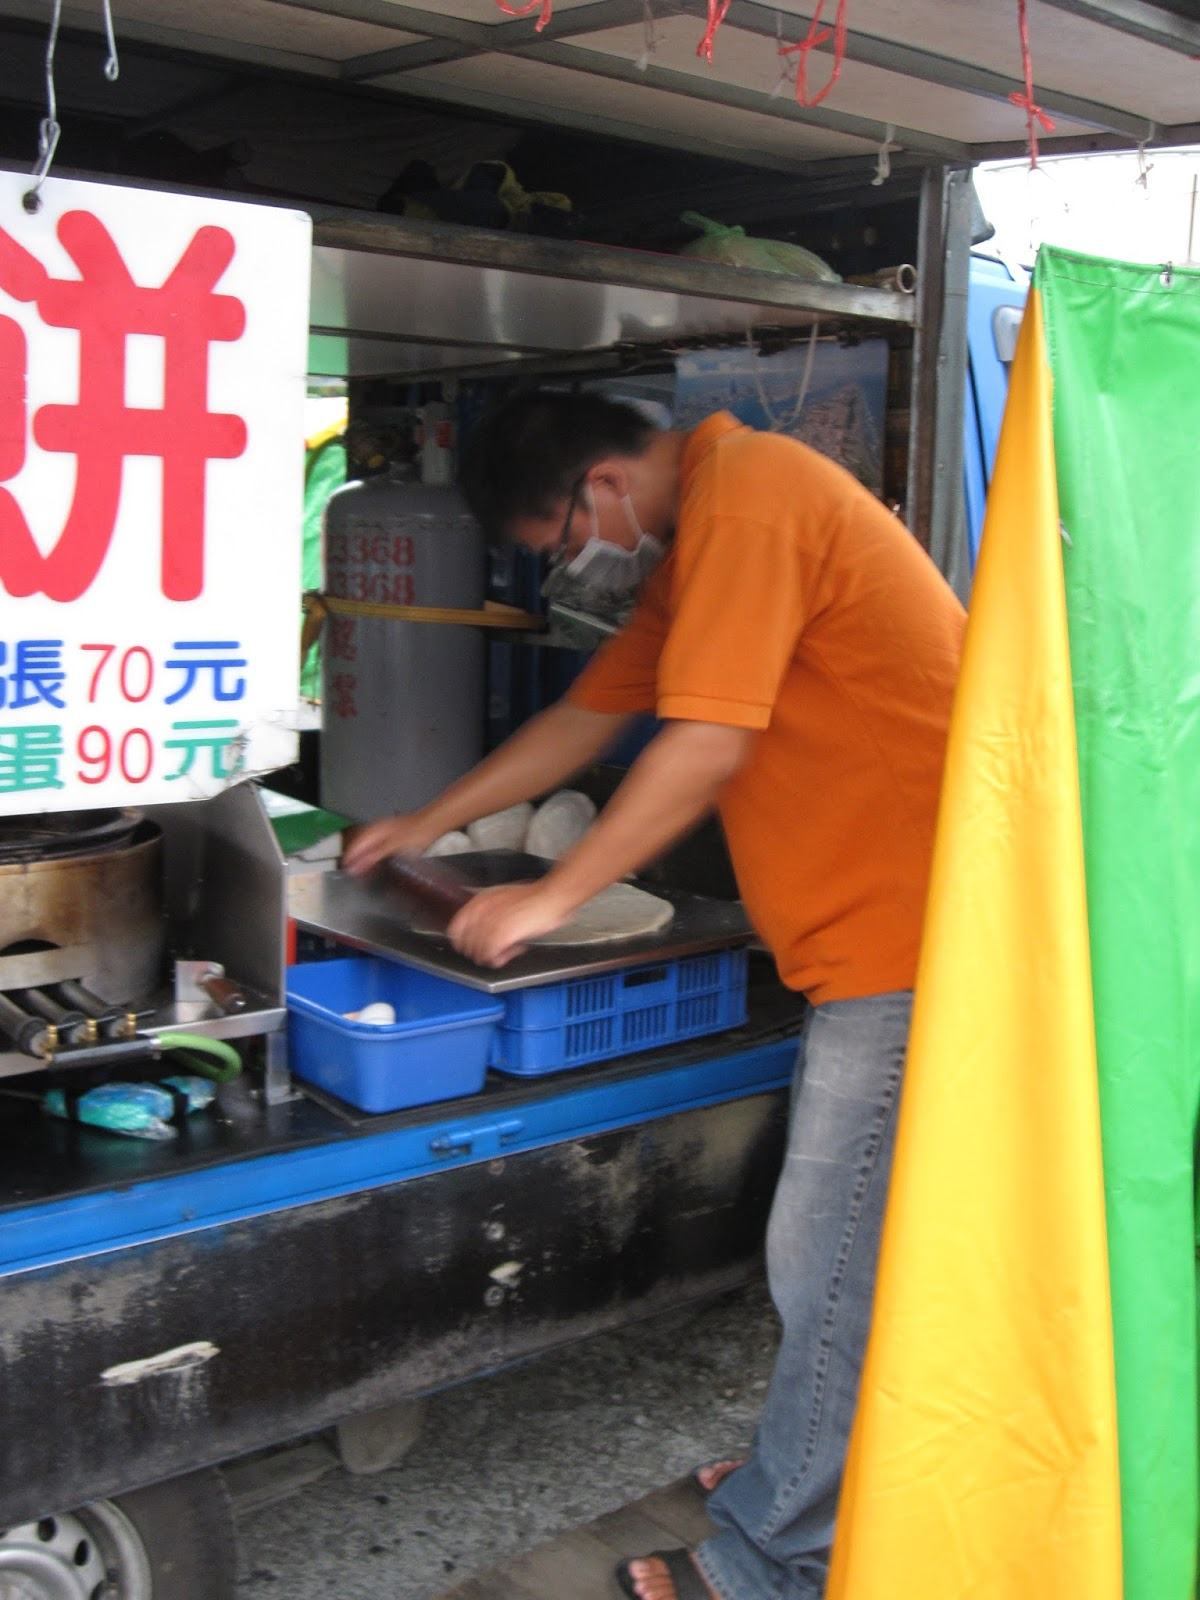 popopig eat everywhere: 臺南 新瀛蔥油餅